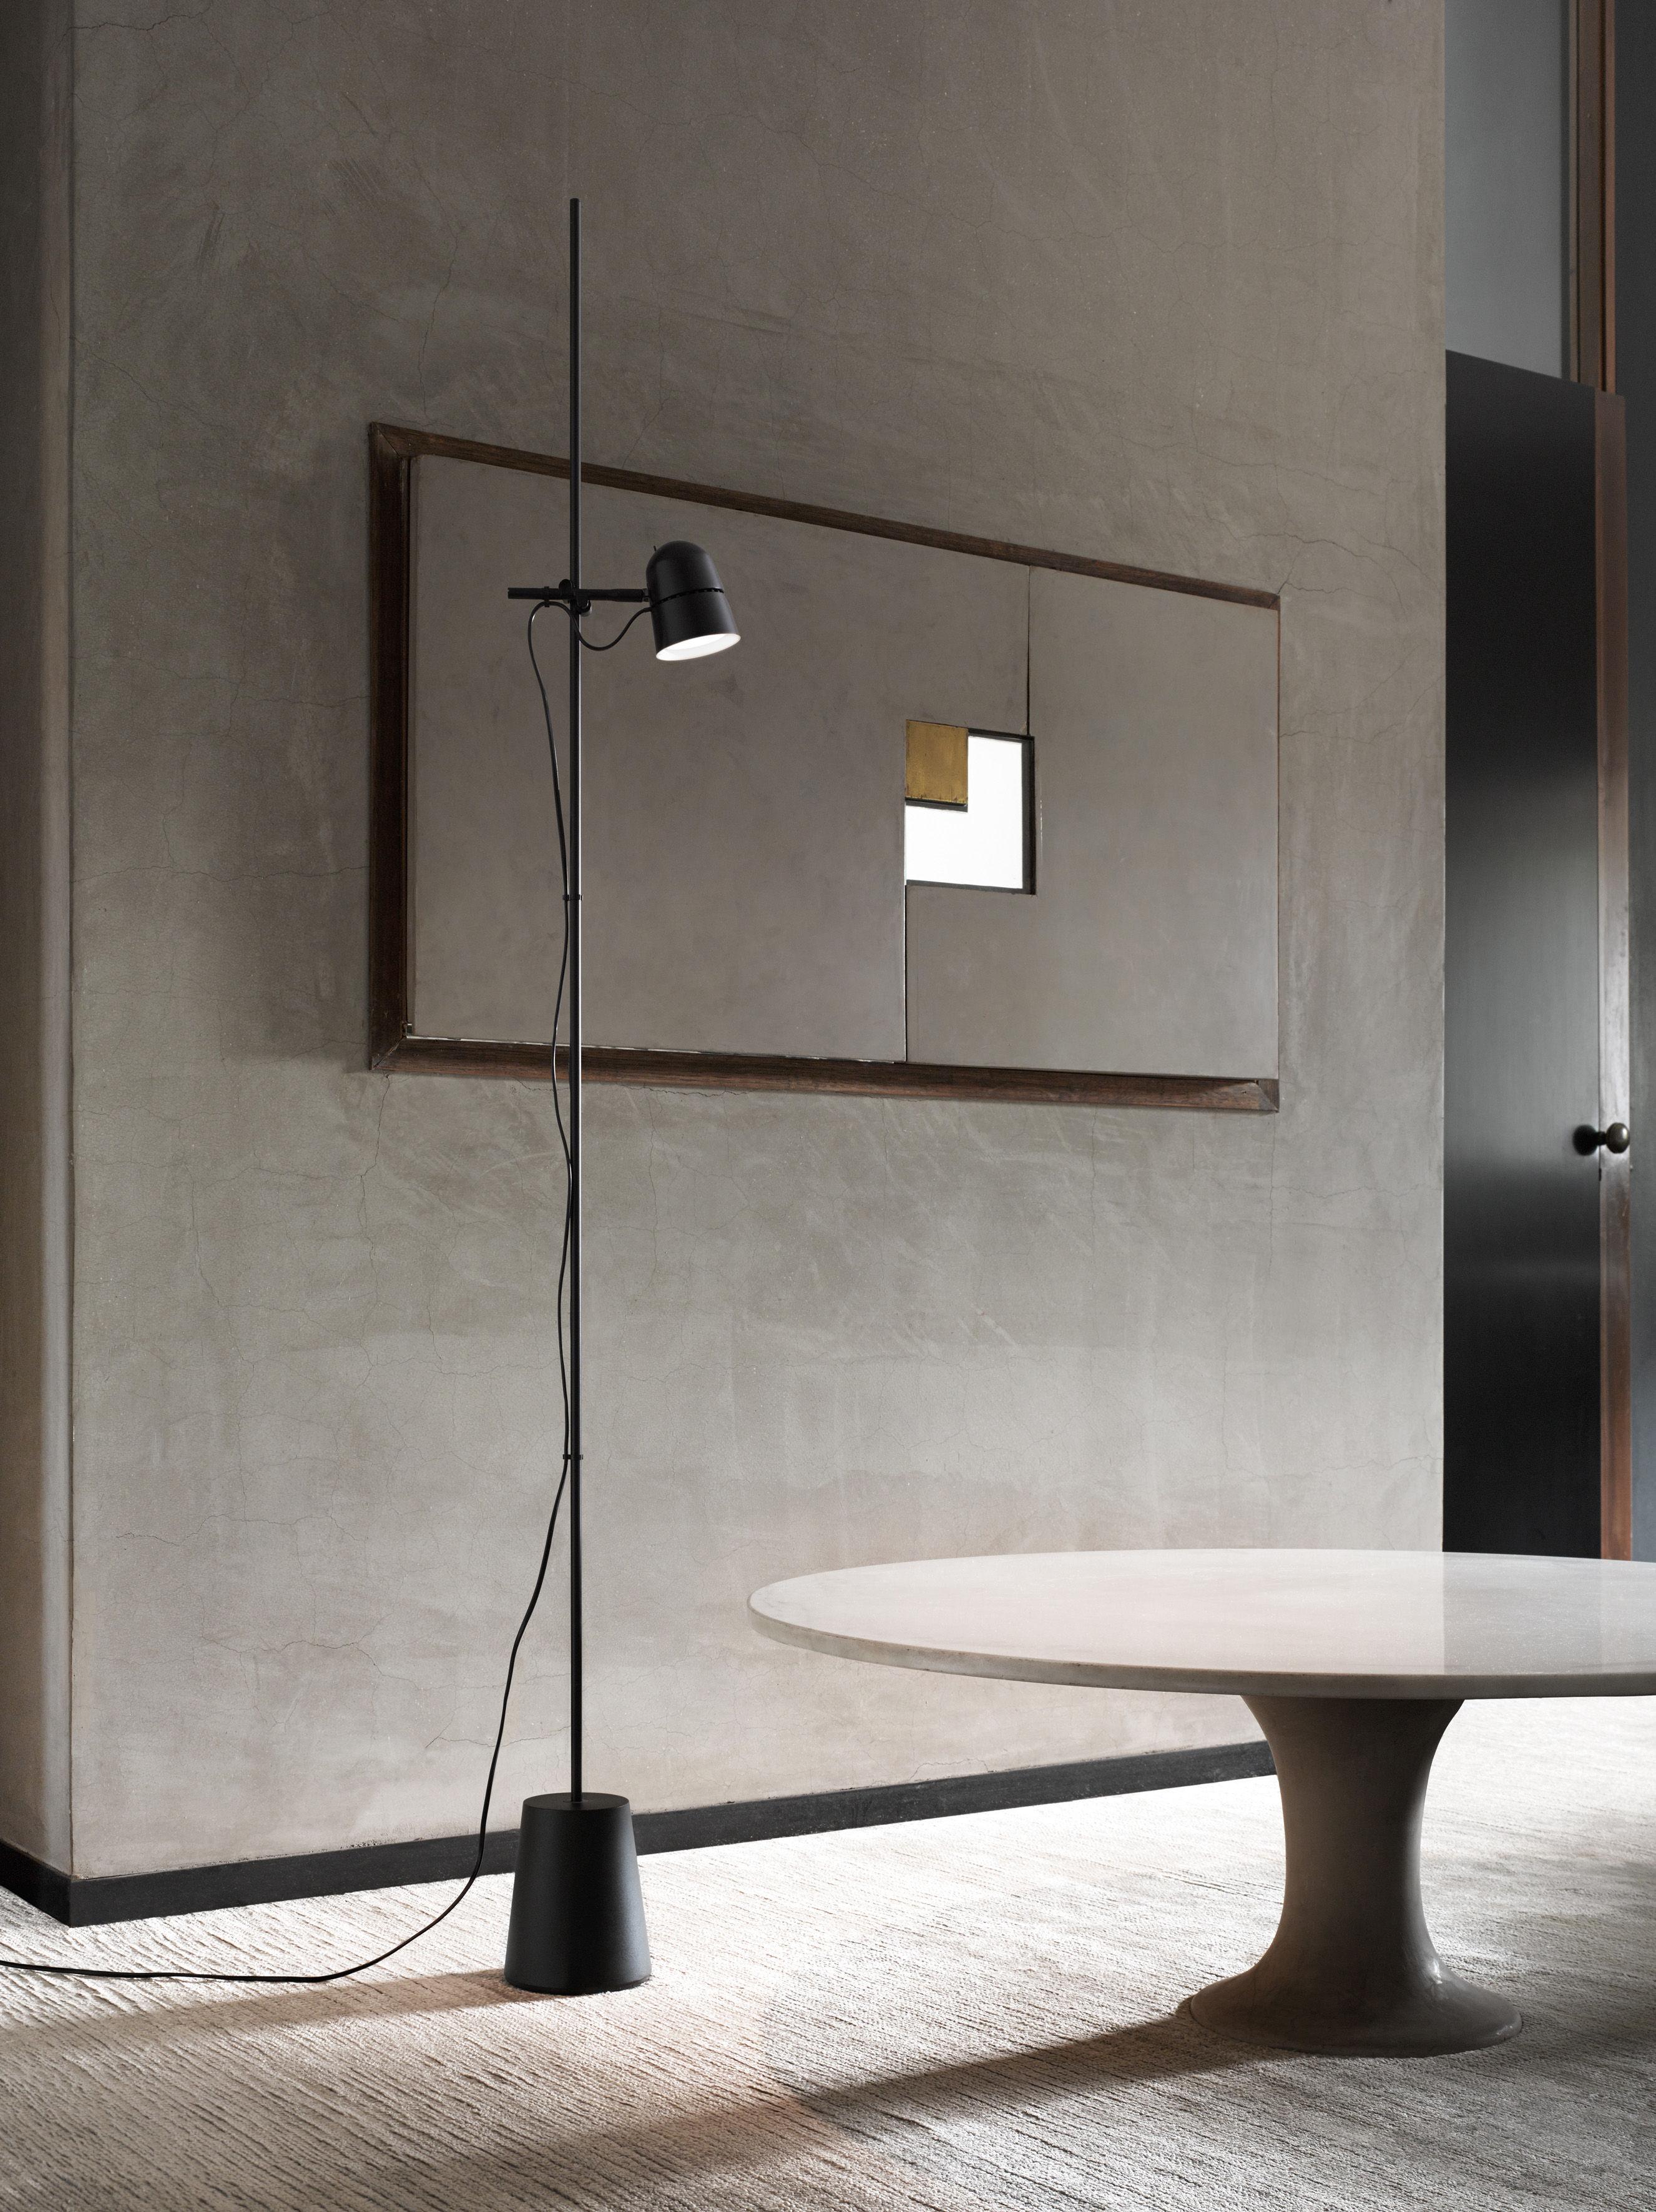 counterbalance stehleuchte led verstellbarer lampenschirm h 170 cm schwarz by luceplan. Black Bedroom Furniture Sets. Home Design Ideas